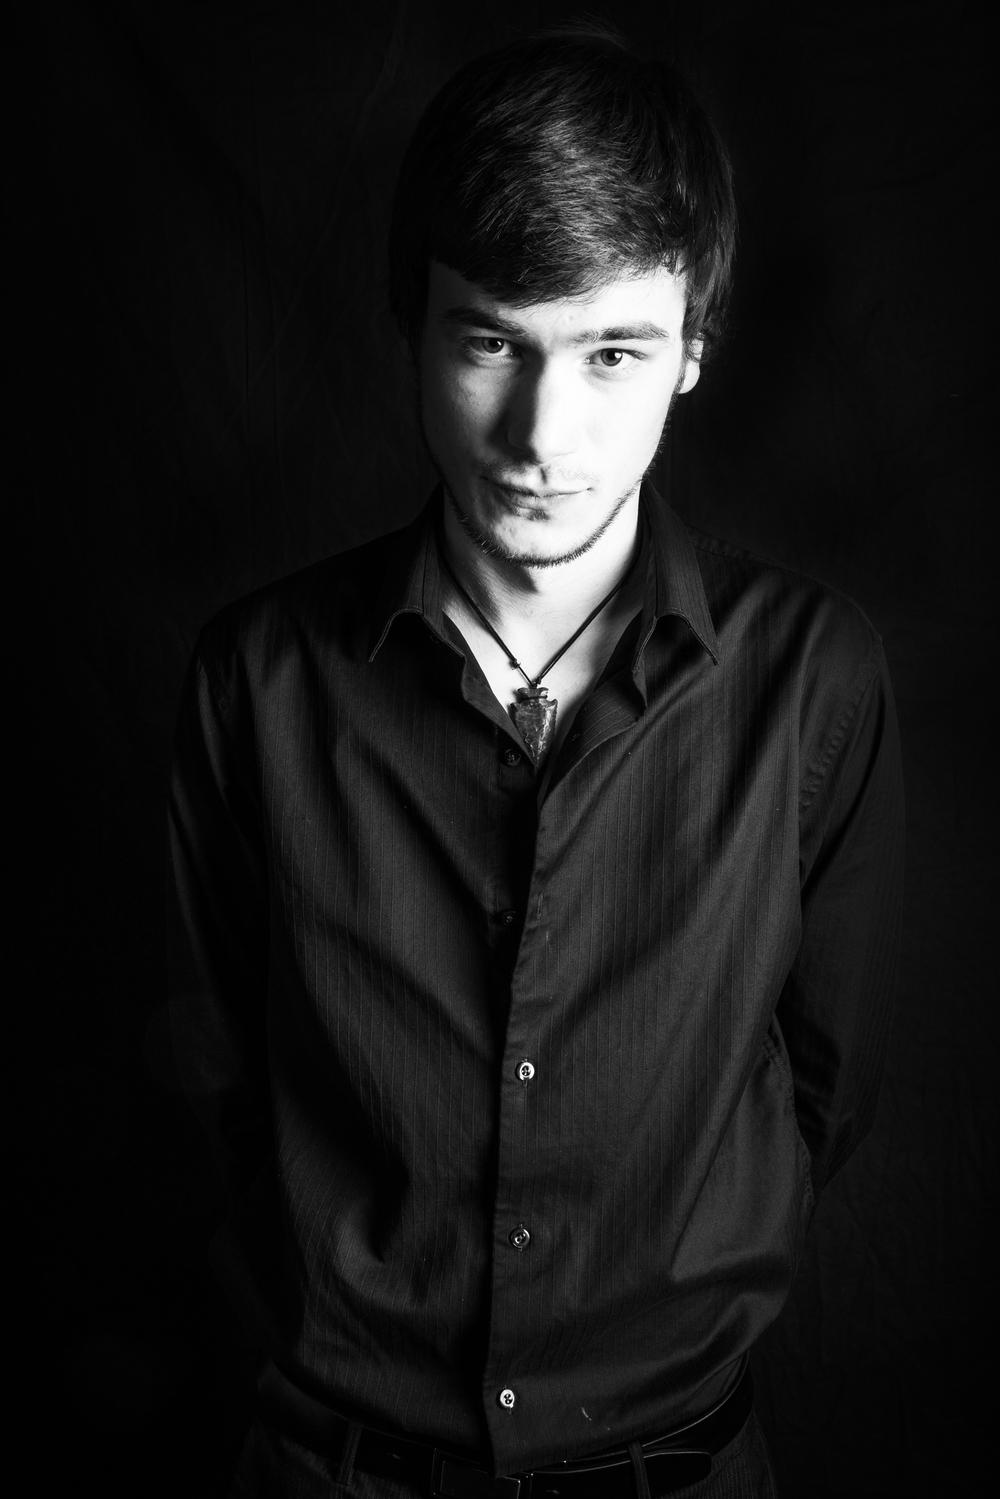 professionalportrait-24.jpg